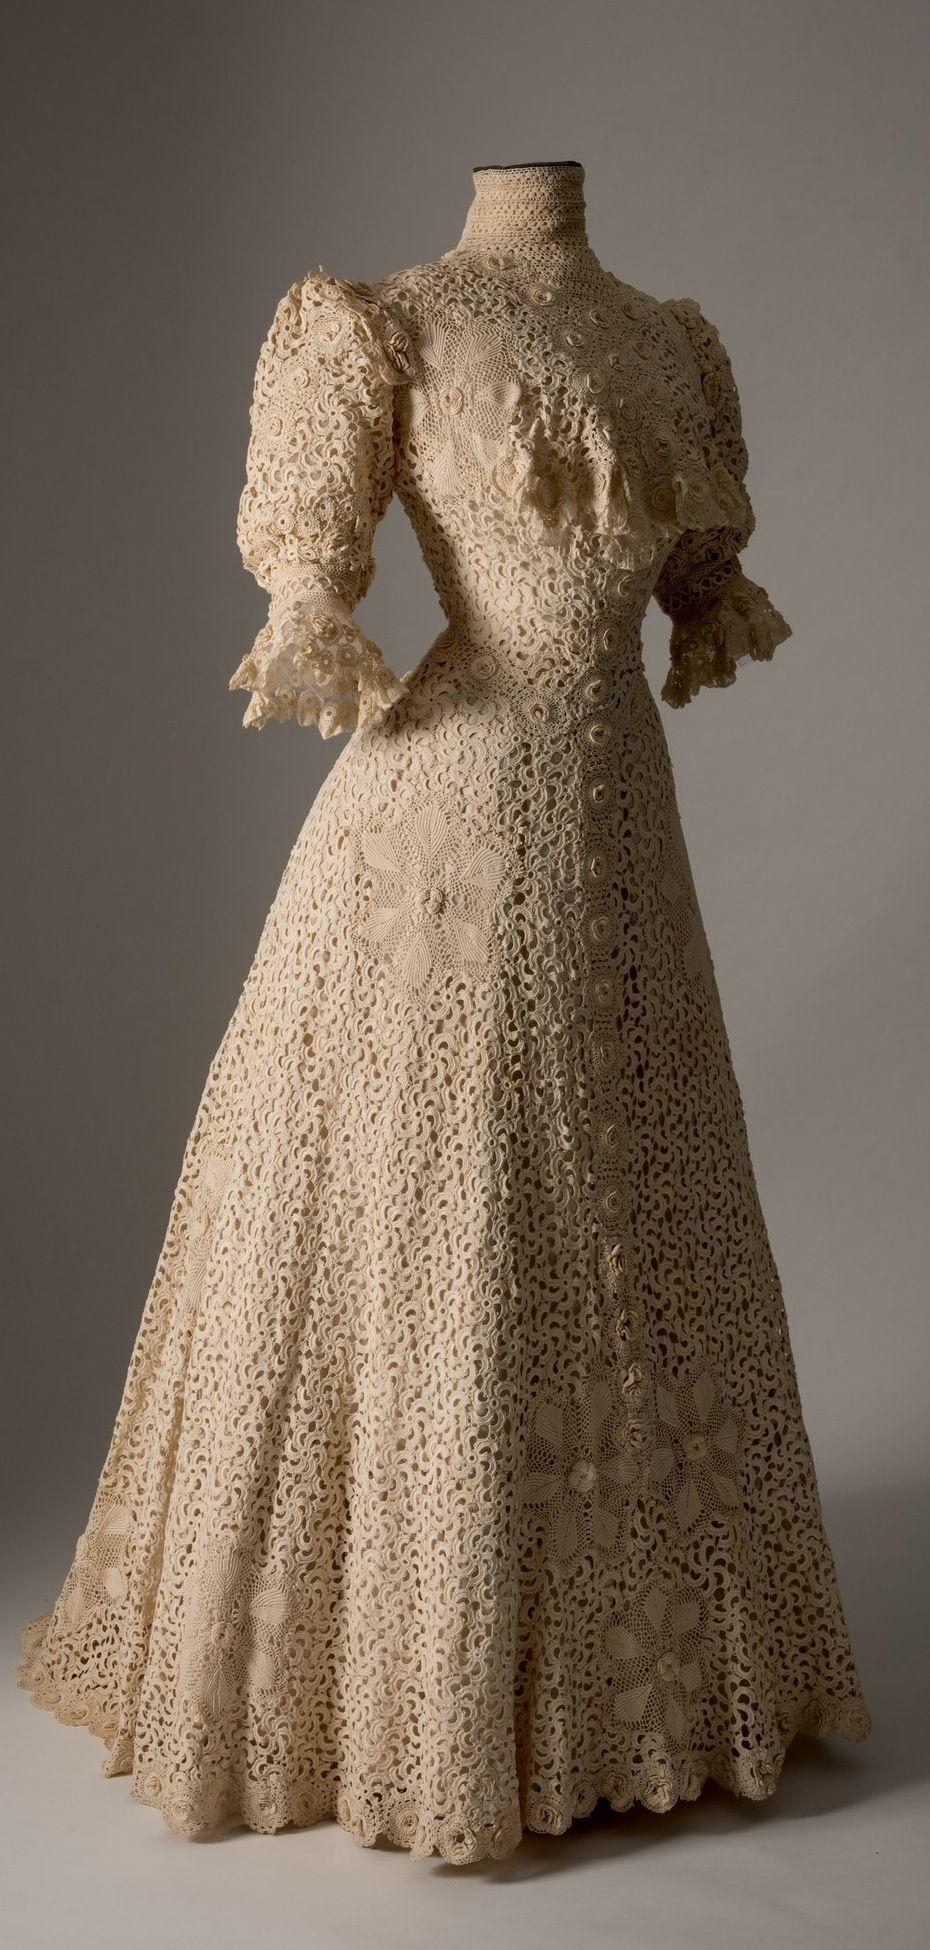 Cream crochet lace dress, c. 1900. Collection of Fashion Museum Bath ...